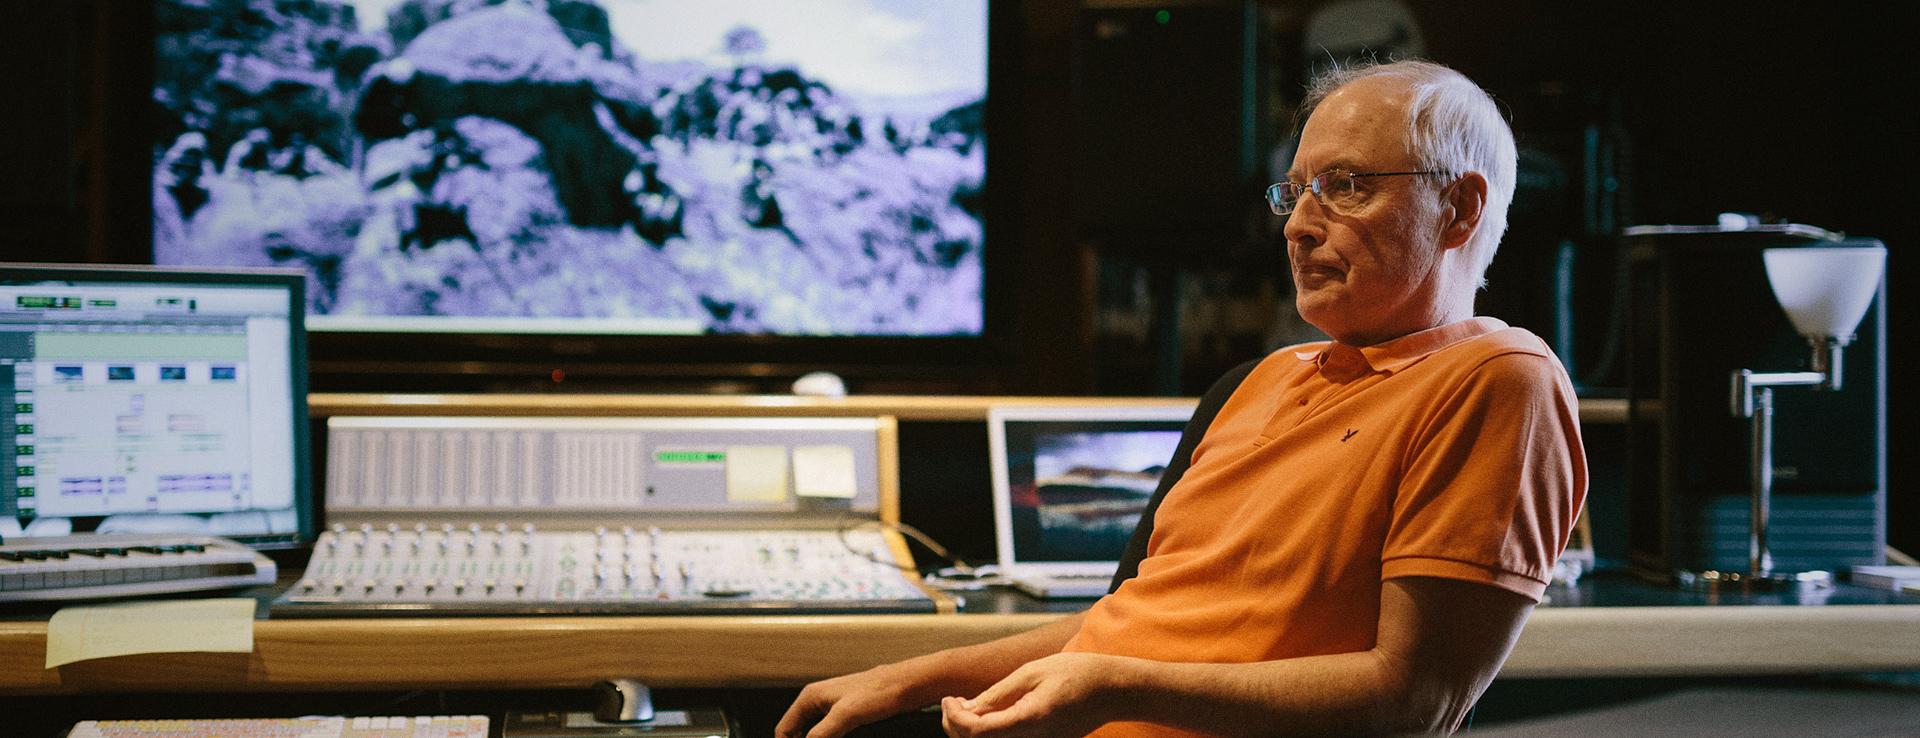 Ben Burtt and His Contribution to Sci-fi Sound Design